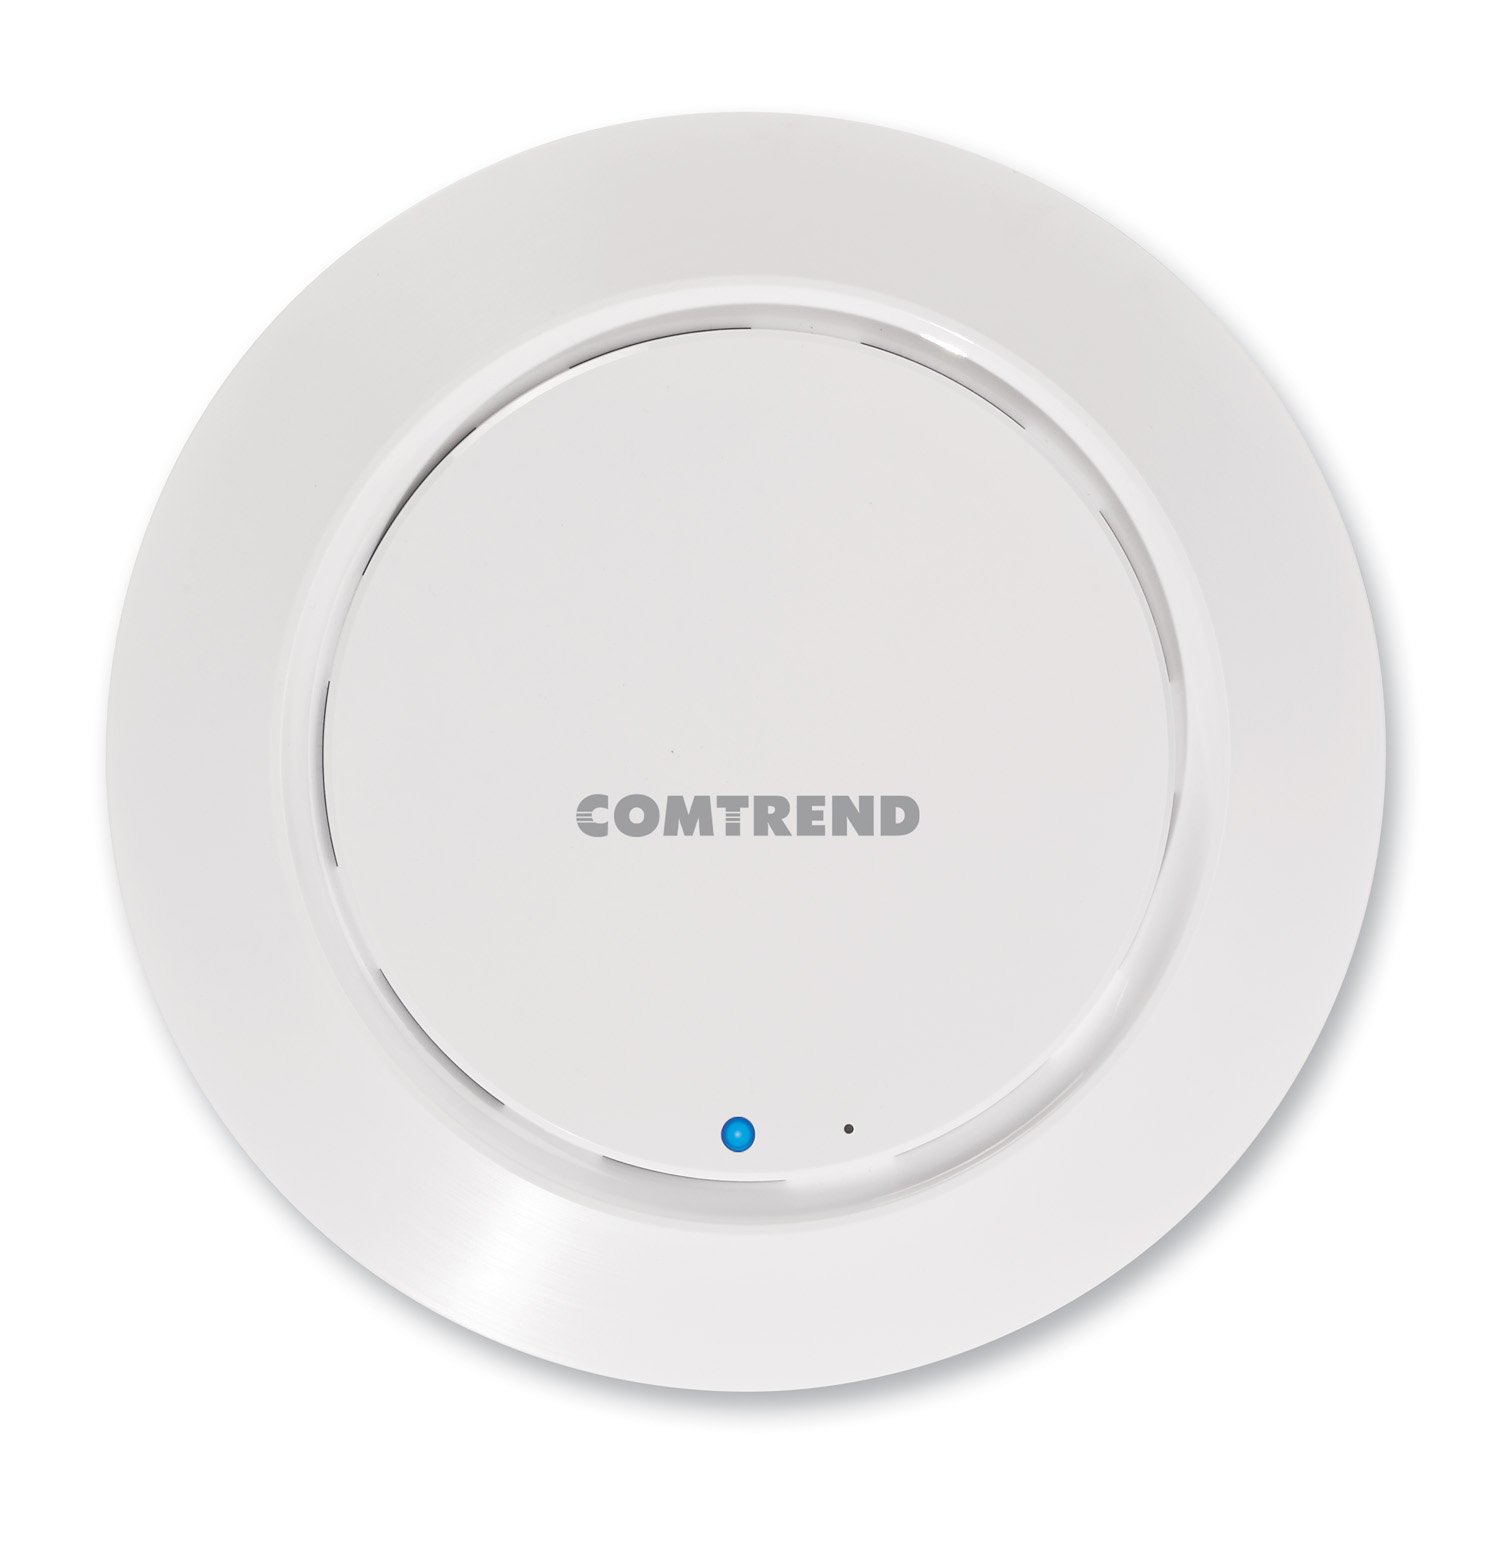 Comtrend WAP-EN300C 300N Managed Single Band Wireless Access Point by Comtrend